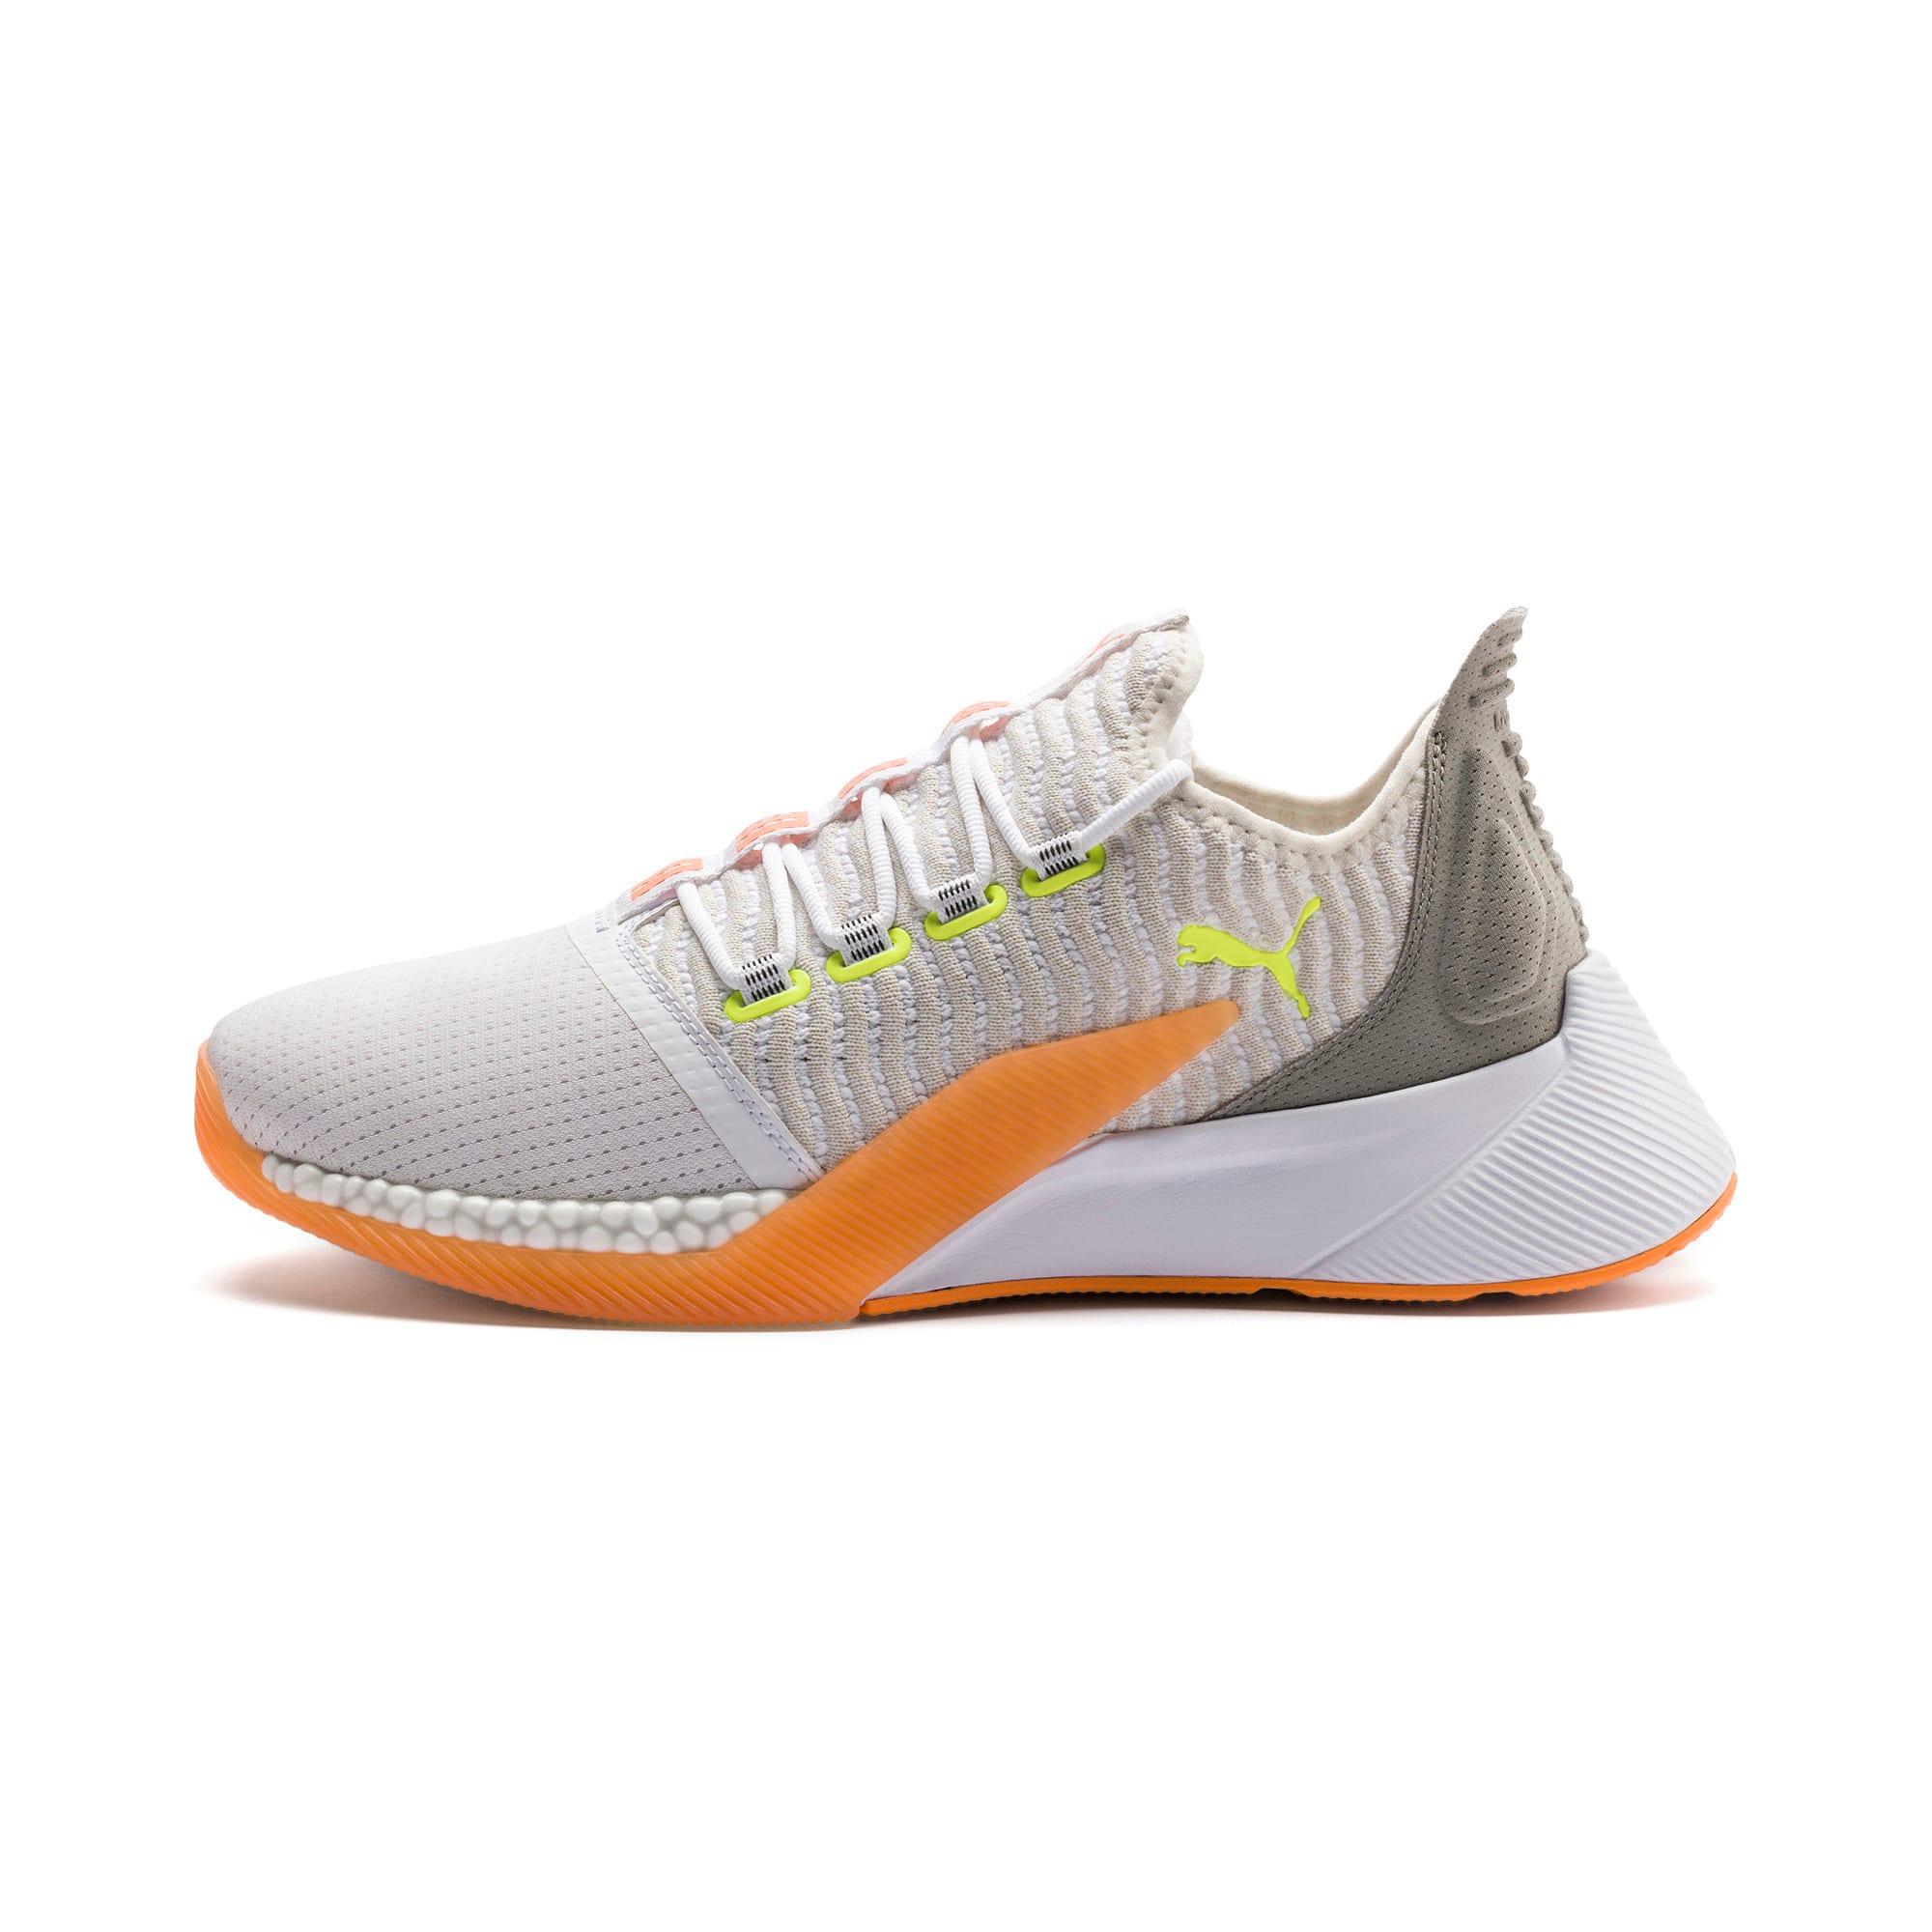 Thumbnail 1 of Xcelerator Daylight Running Shoes, White-VGray-Orange-Yellow, medium